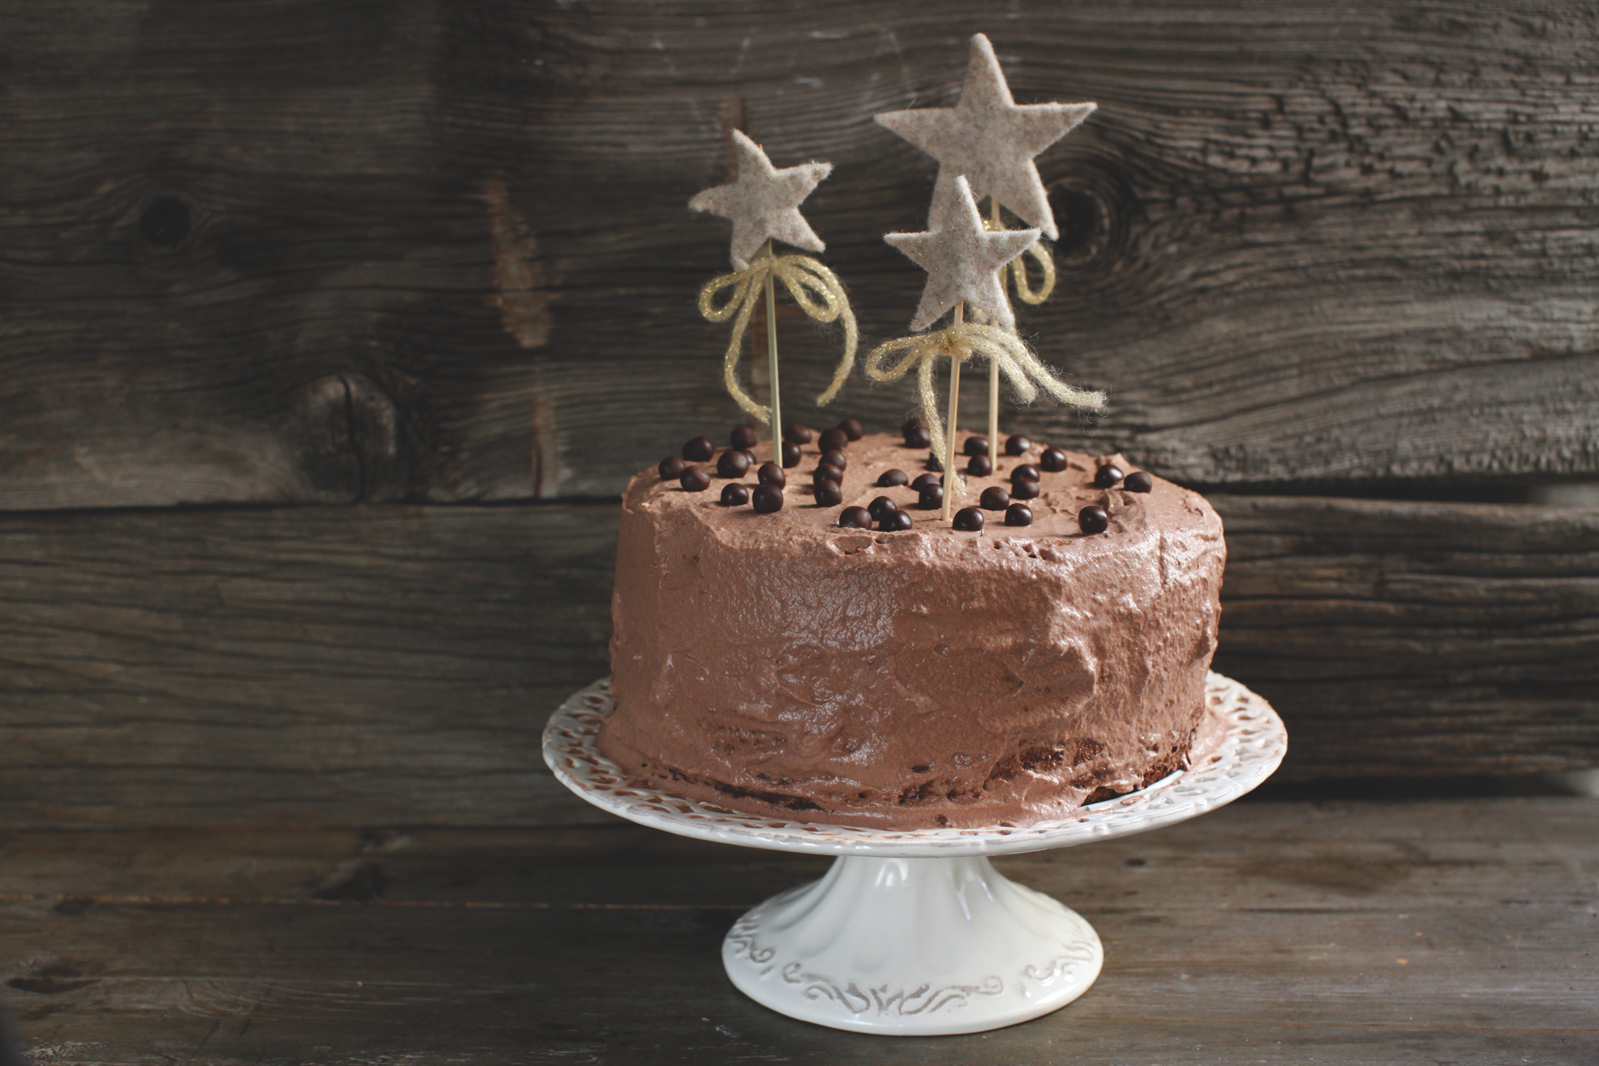 pici-e-castagne-torta-caffe-3